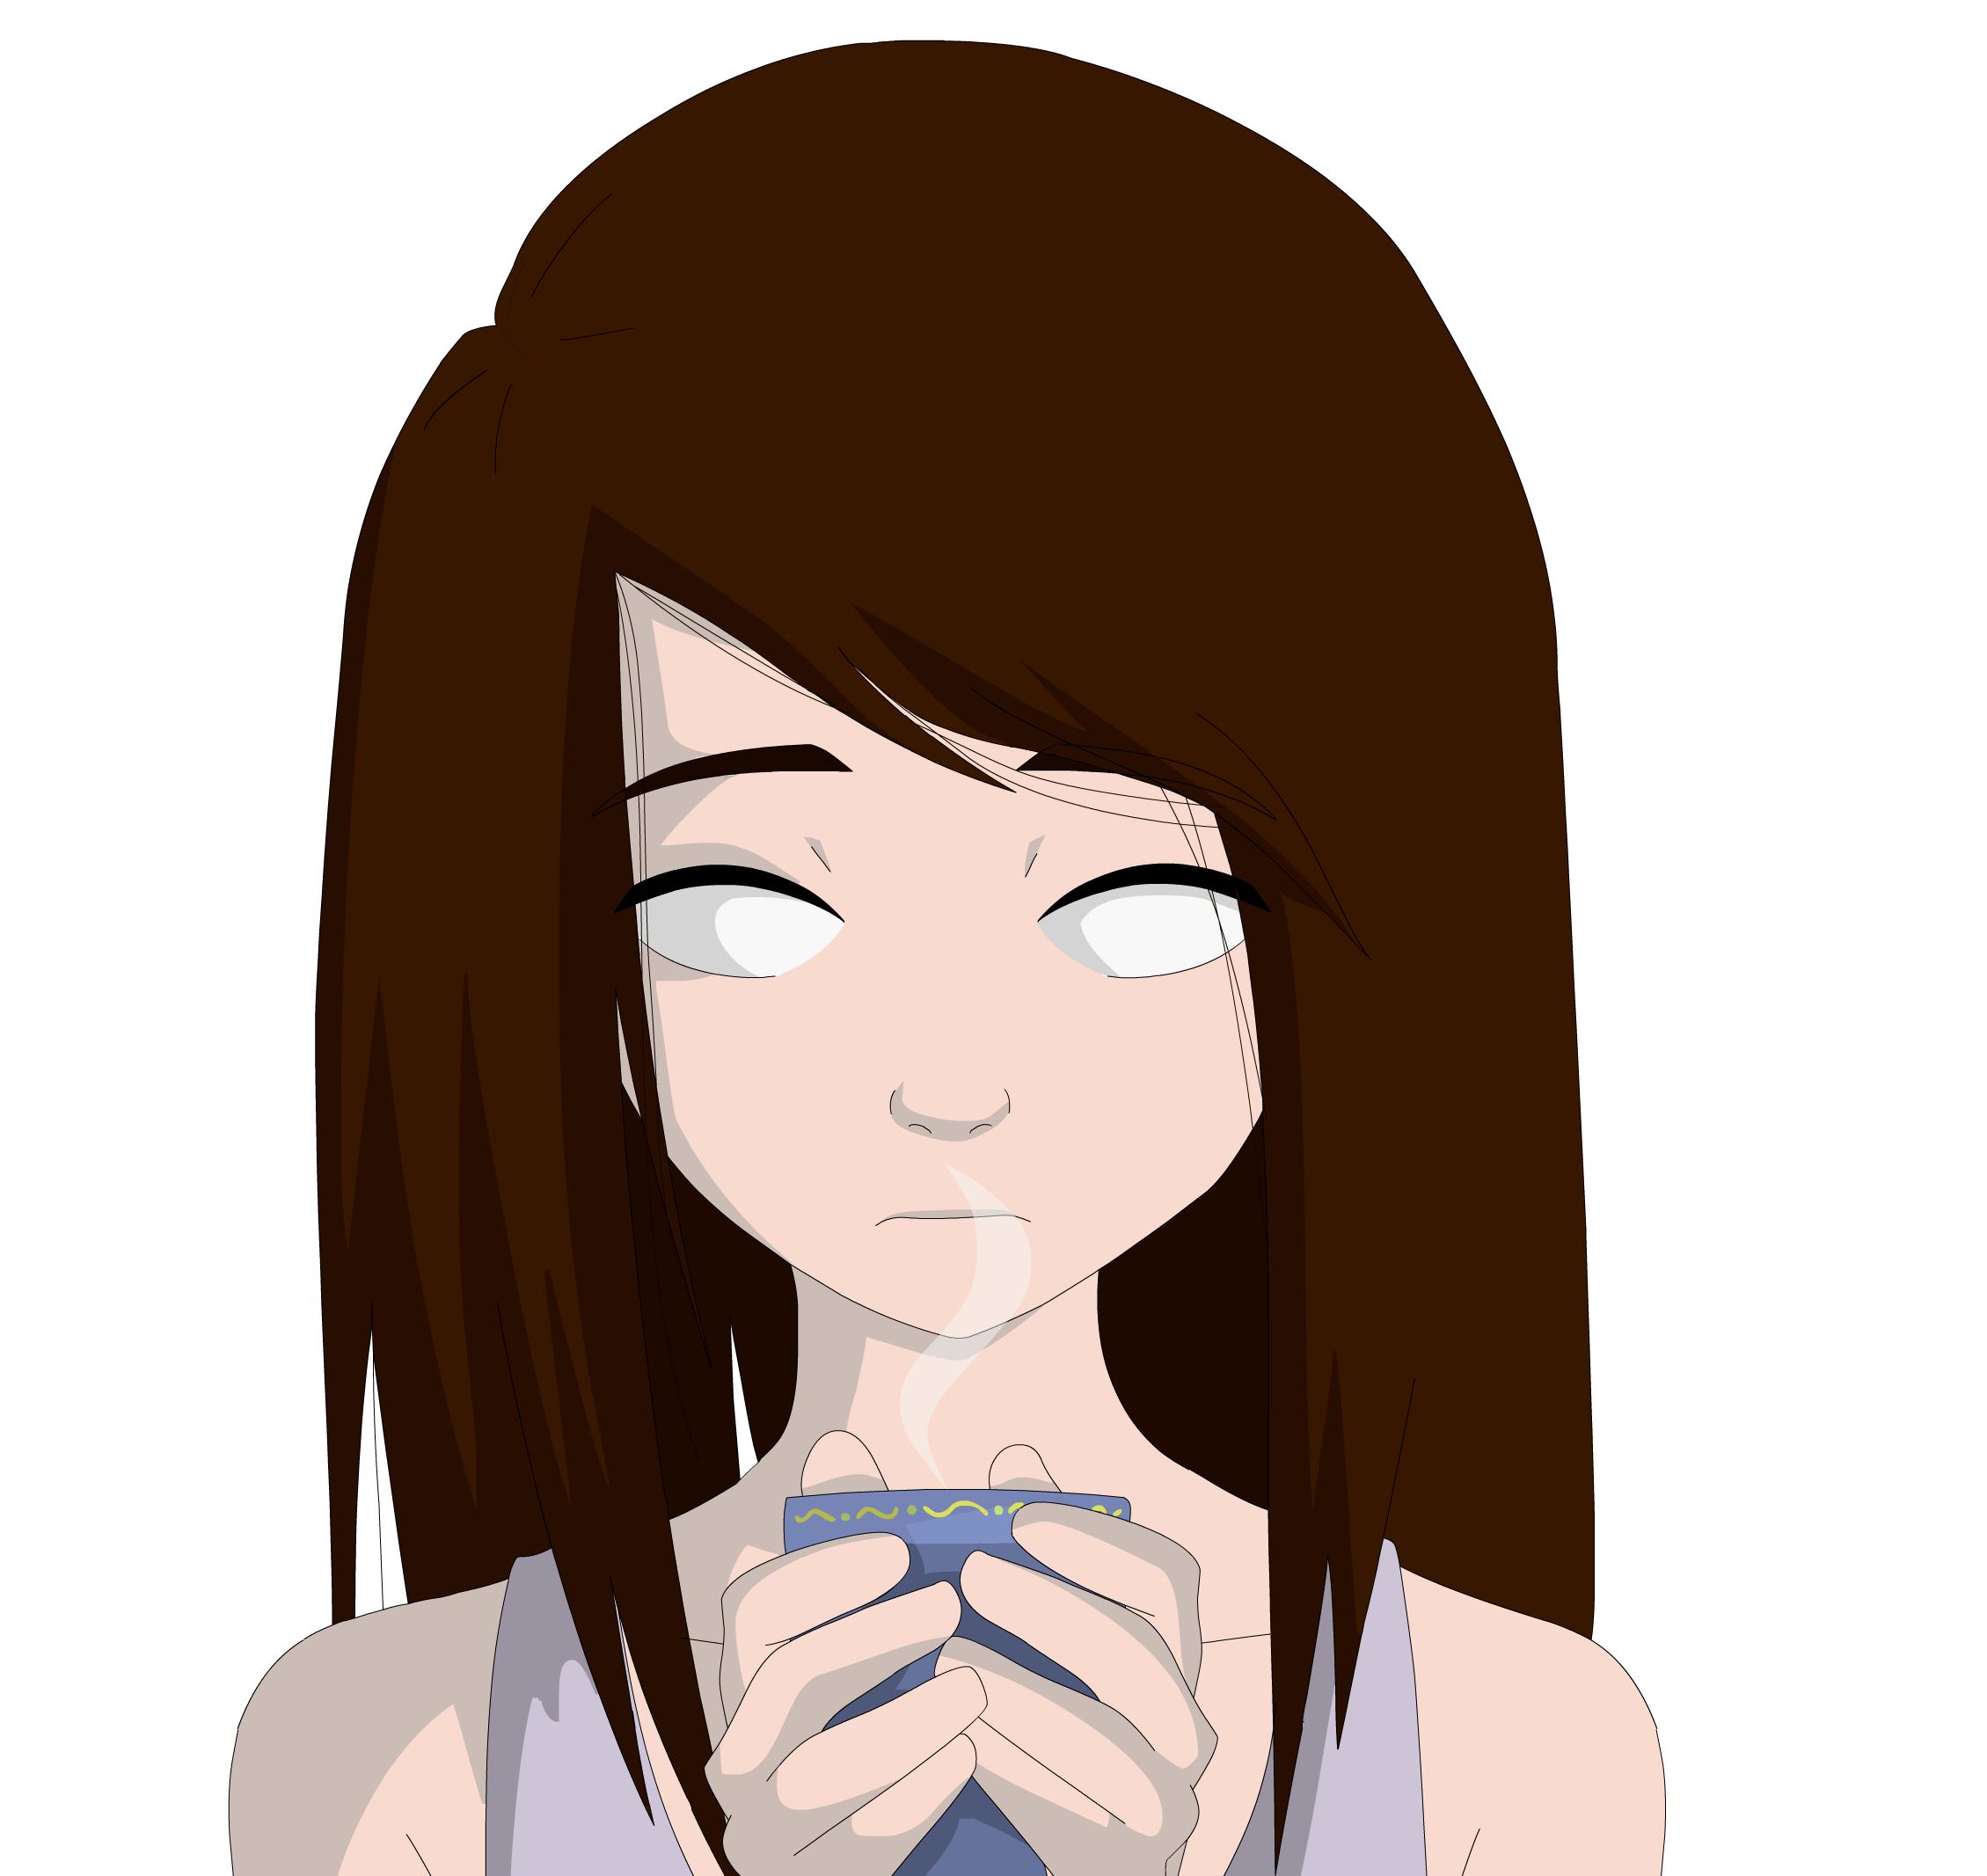 Coffee & Thinking